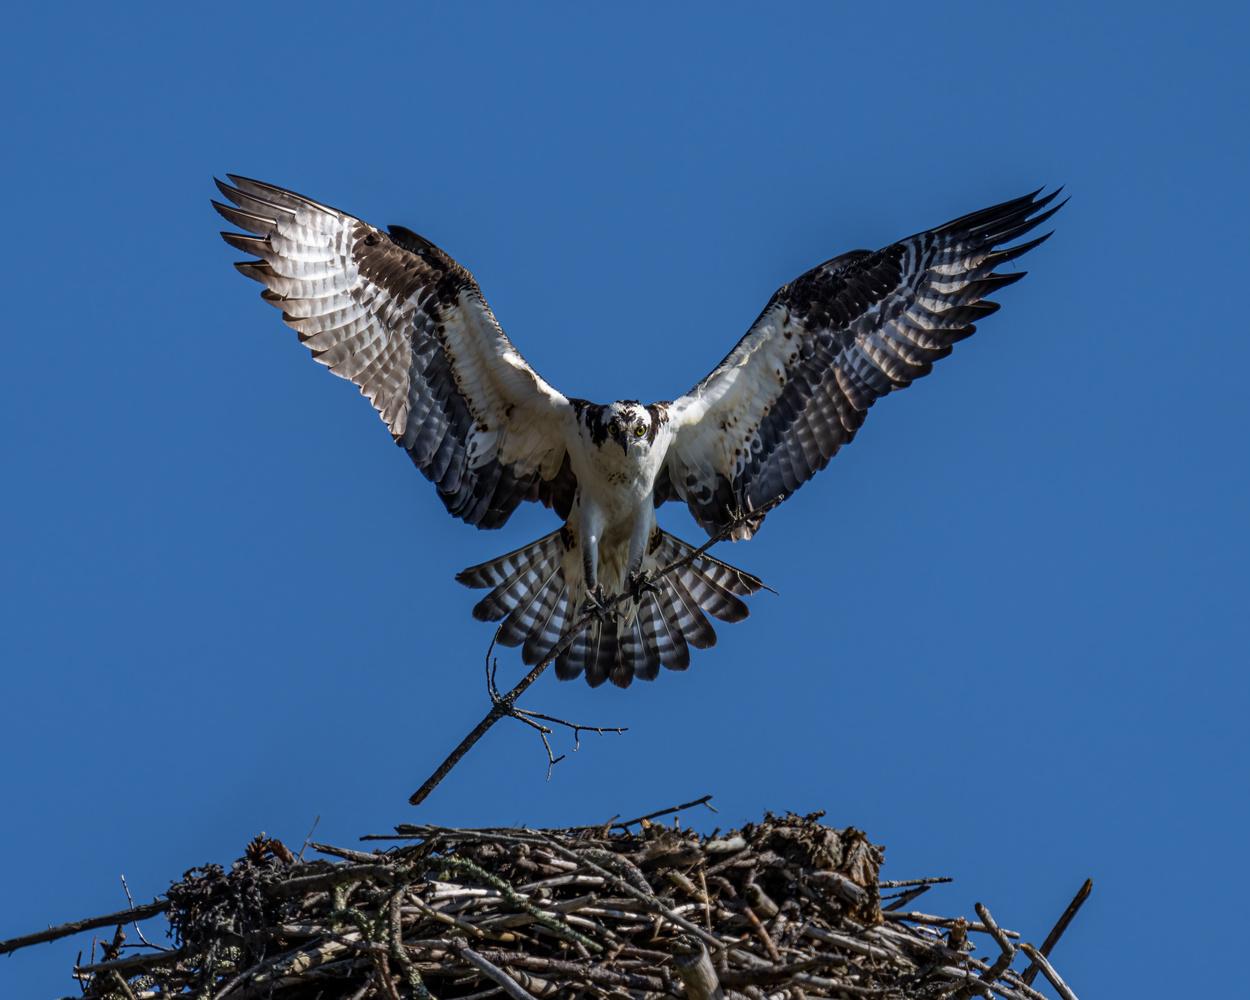 Osprey by Skyler Ewing